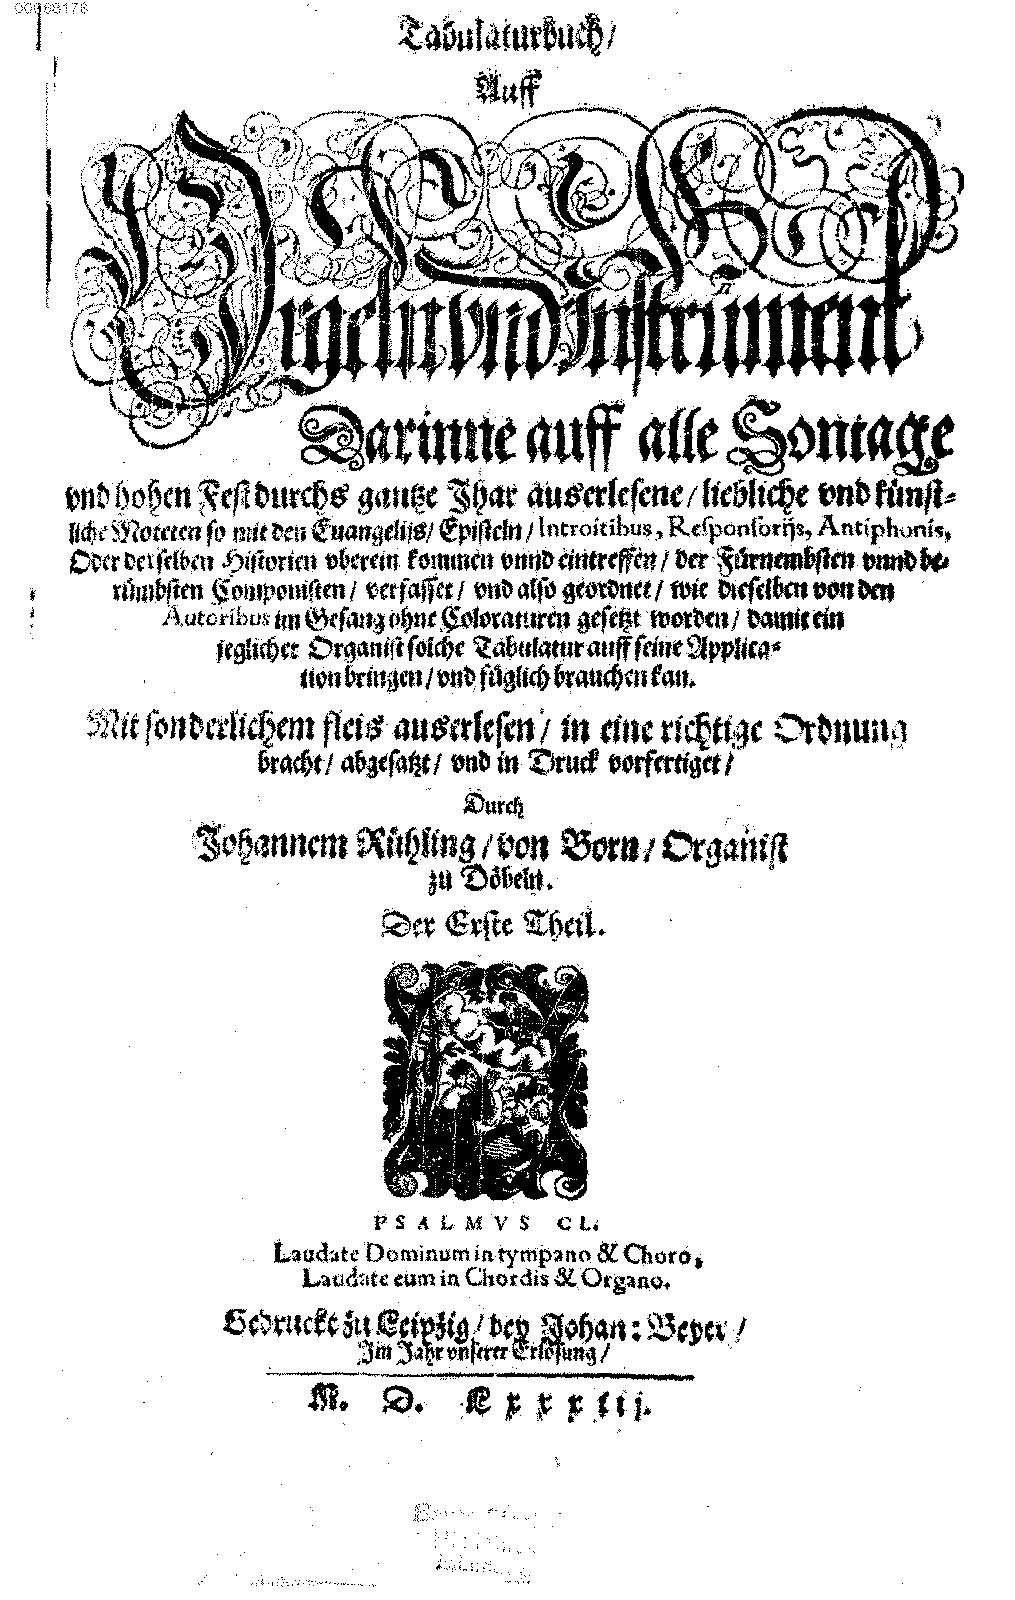 Tabulaturbuch auff Orgeln und Instrument Rühling Johannes IMSLP Petrucci Music Library Free Public Domain Sheet Music